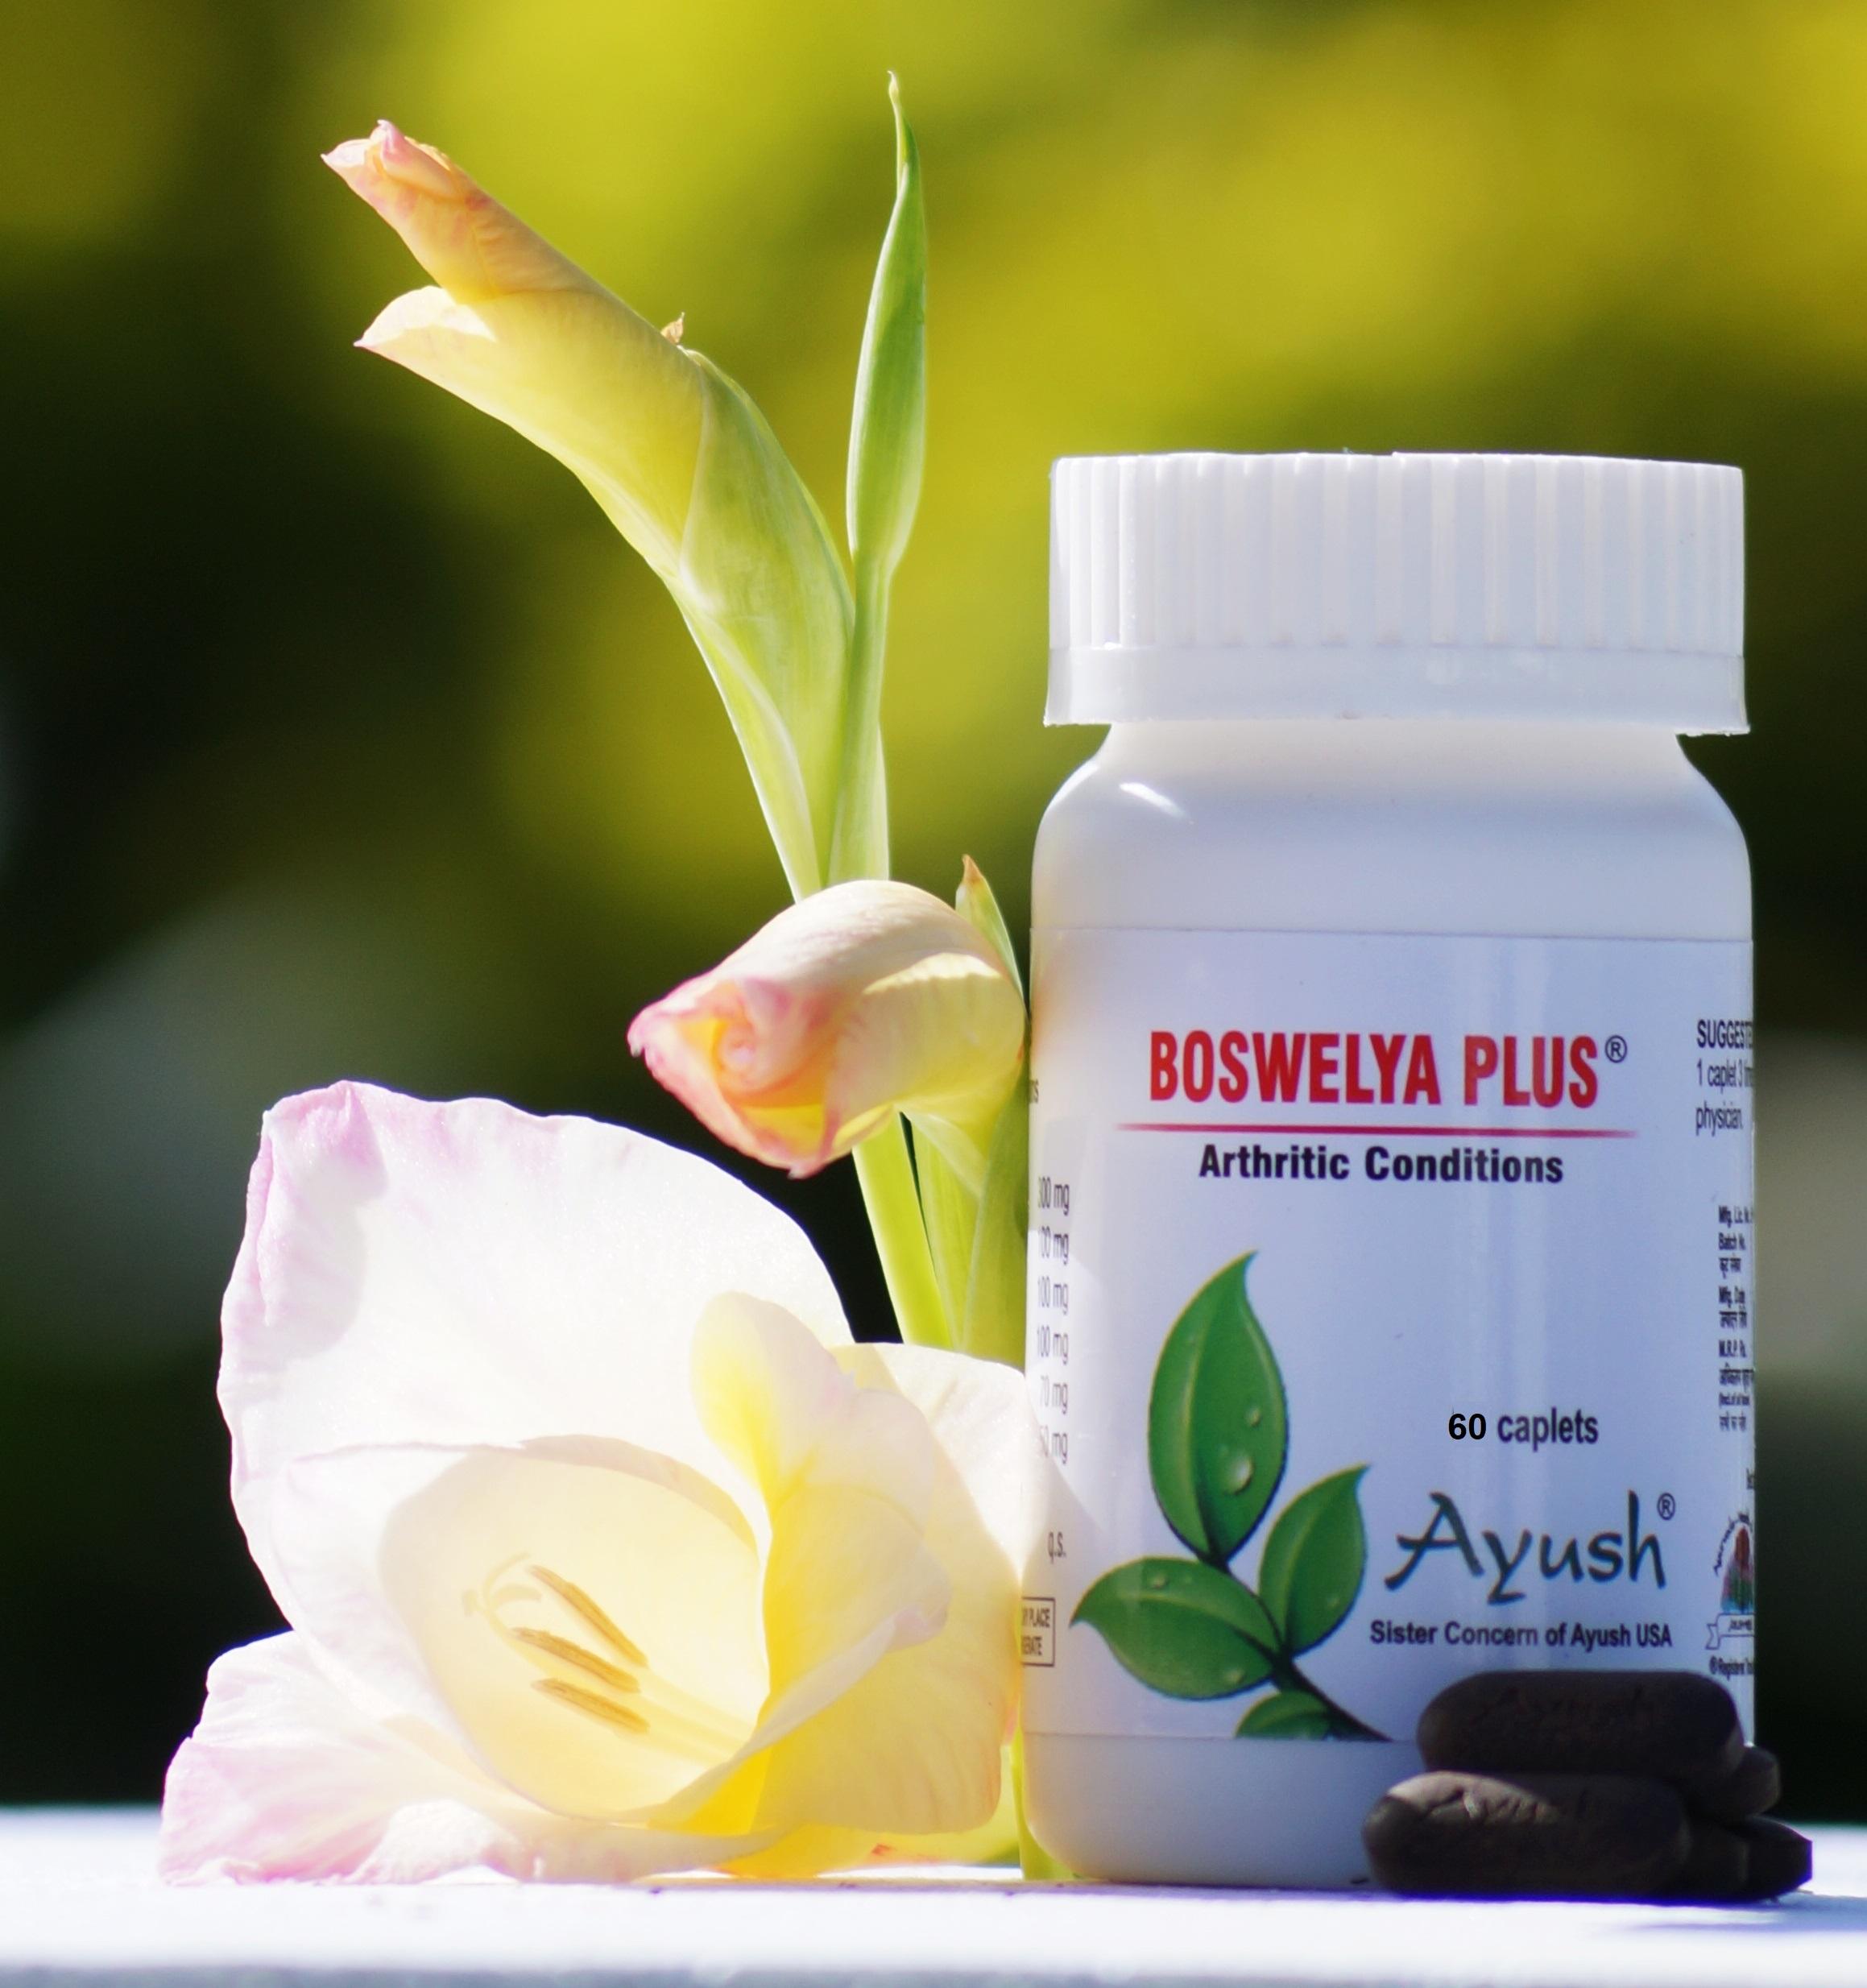 Ayush Herbs Boswelya Plus - Arthritis Support